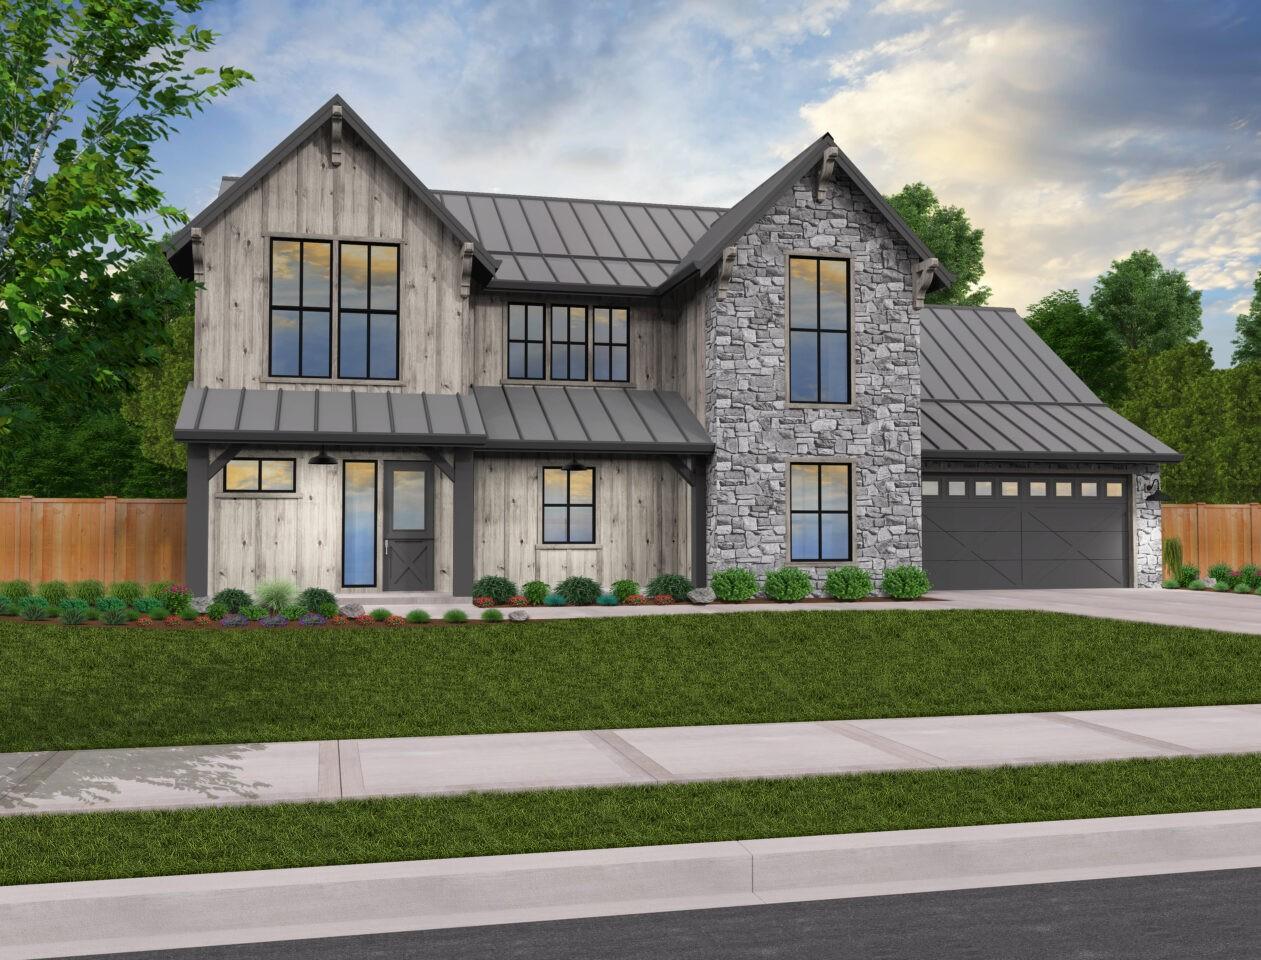 Gold Nugget 5 | Modern Rustic House Plan by Mark Stewart ...